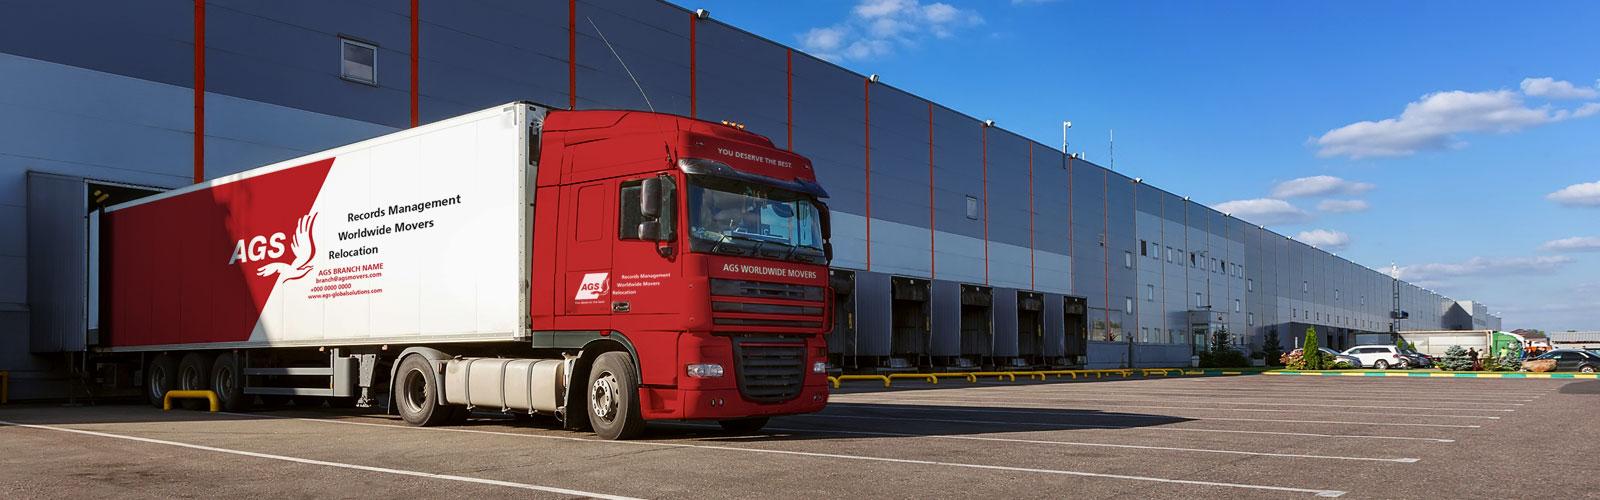 truck-infront-warehouse